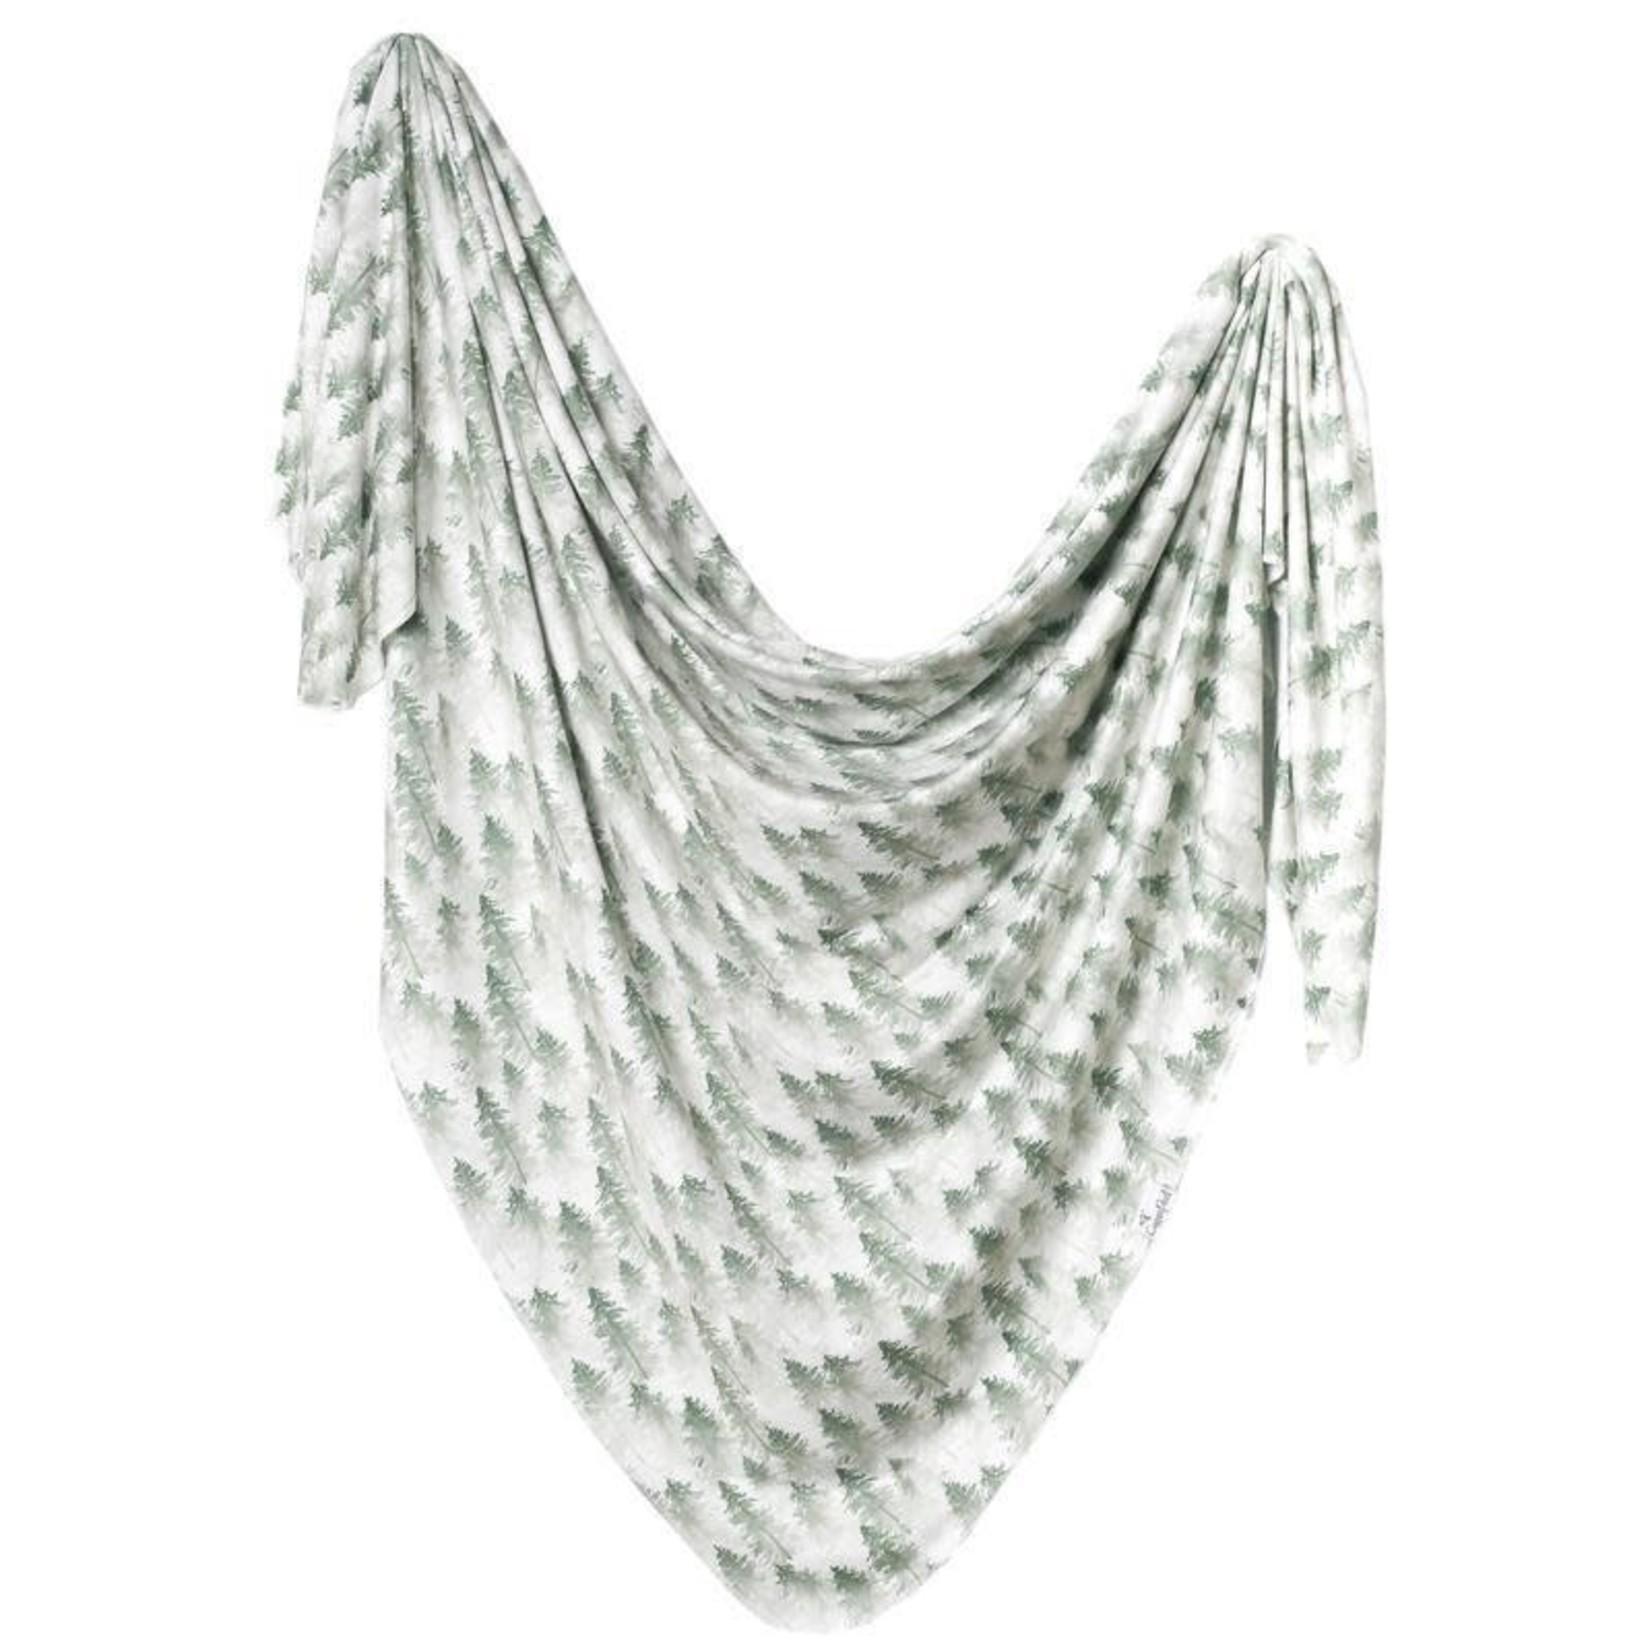 Copper Pearl Knit Blanket - Evergreen